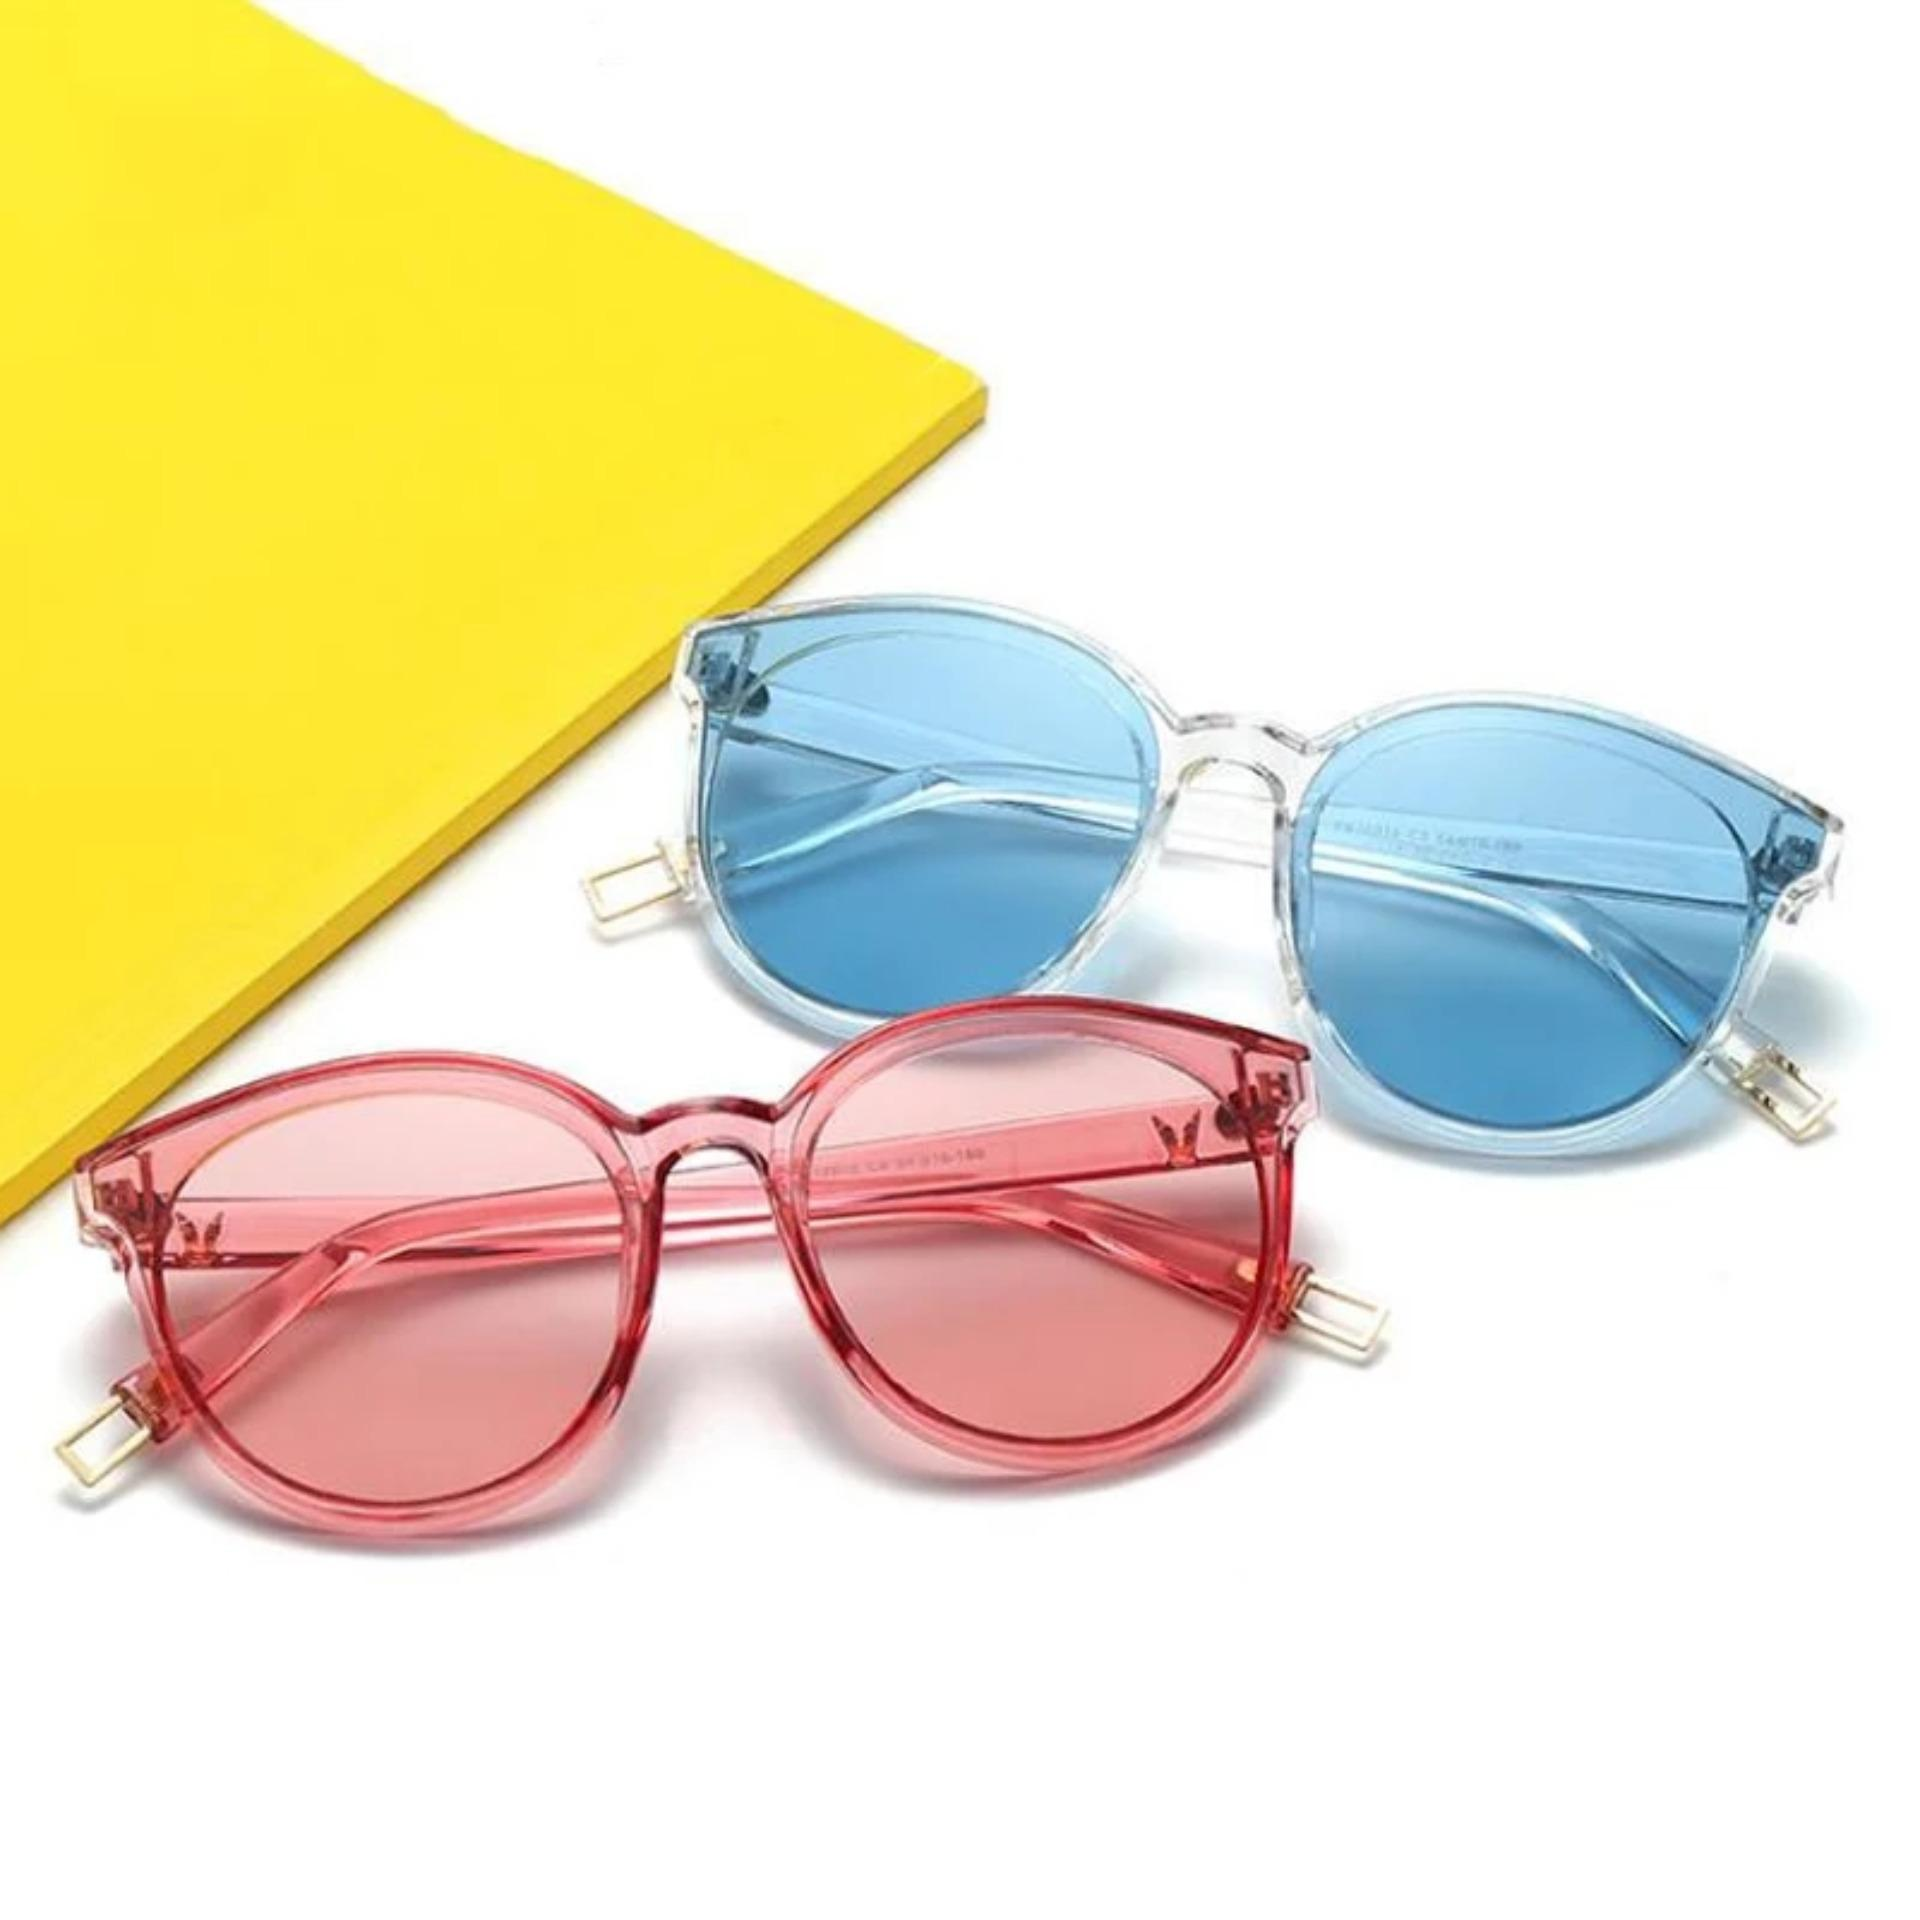 Timely - Ladies Fashion Cat Eye Korean Sunglasses 07889 - Kacamata Fashion  Wanita abc9b3dffd